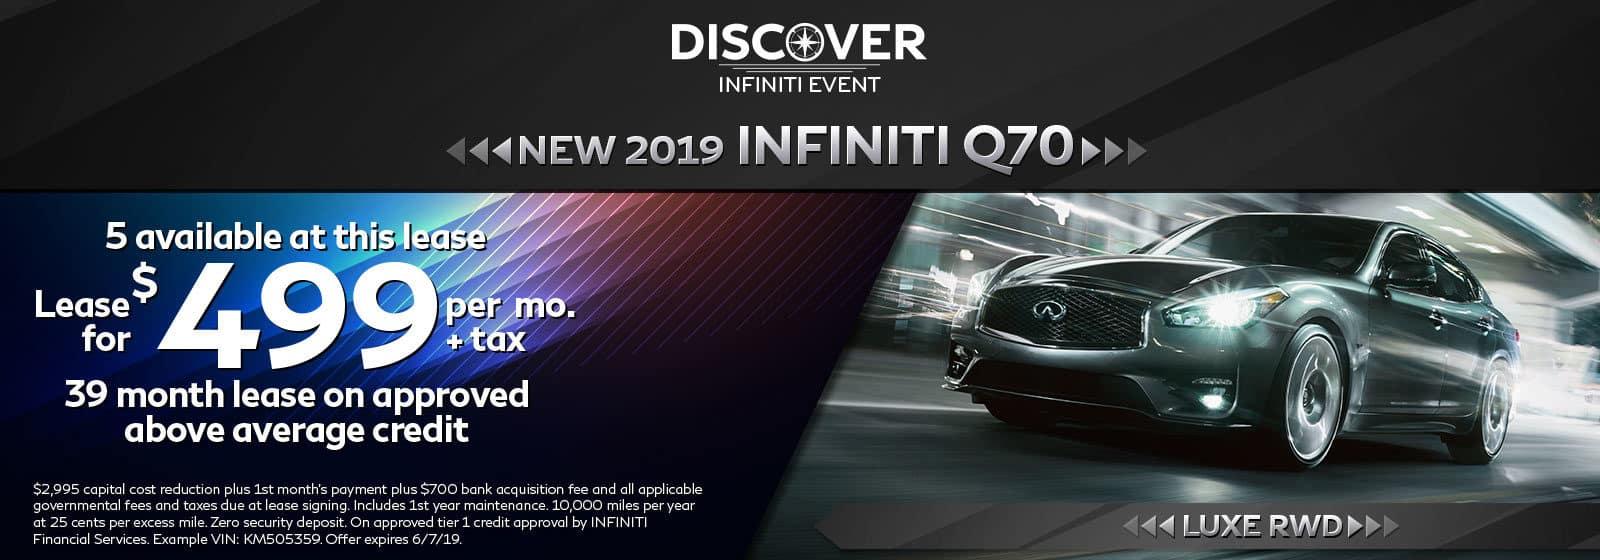 New-2019-Infiniti-Q70